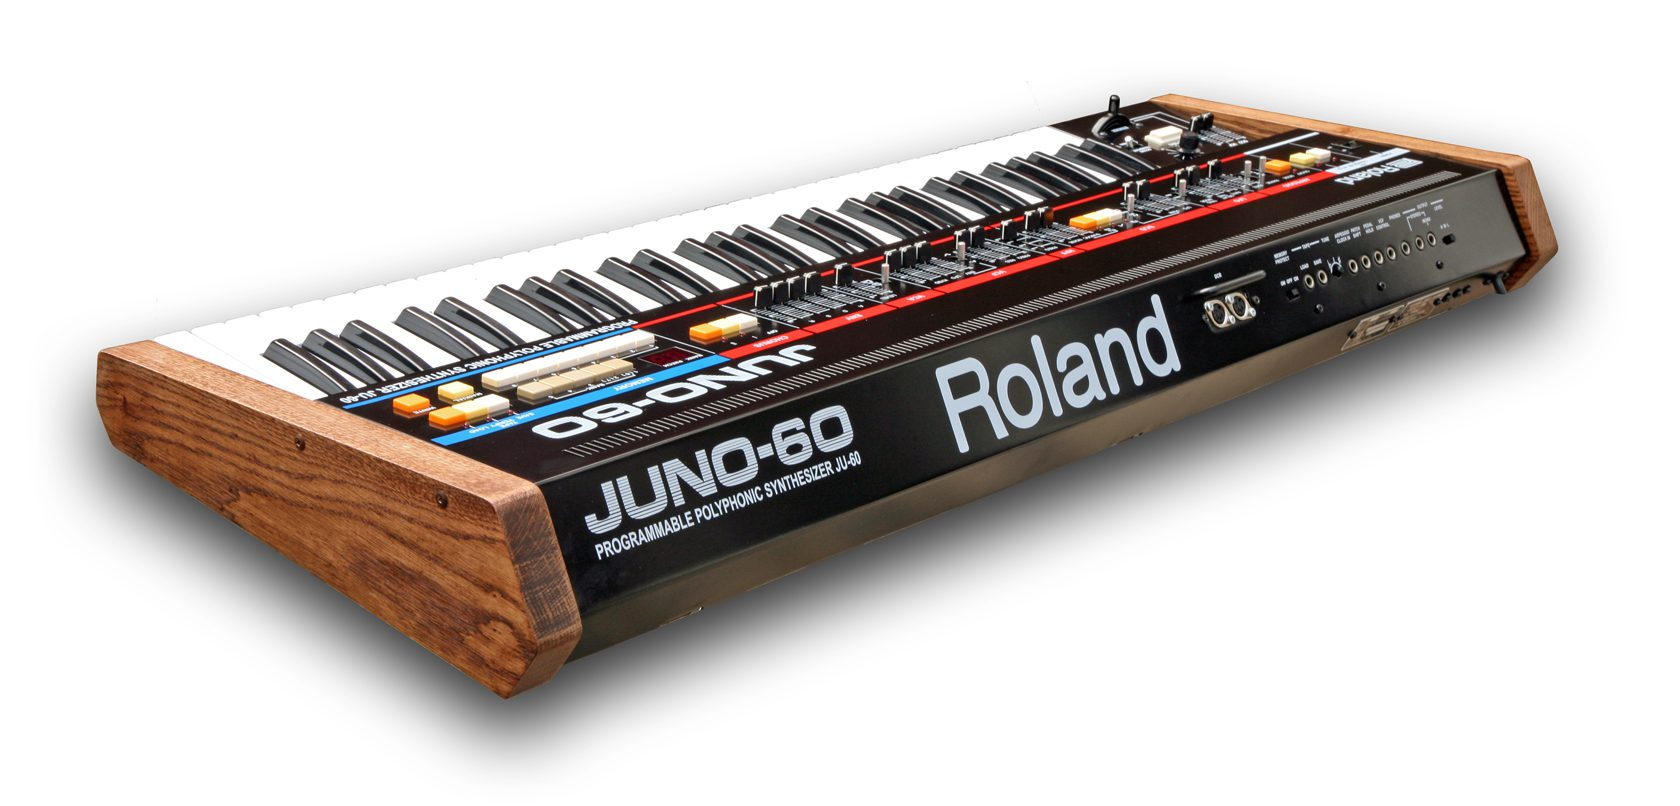 Vergleichstest: Roland Juno-60 vs  TAL U-No-LX V2 Plugin